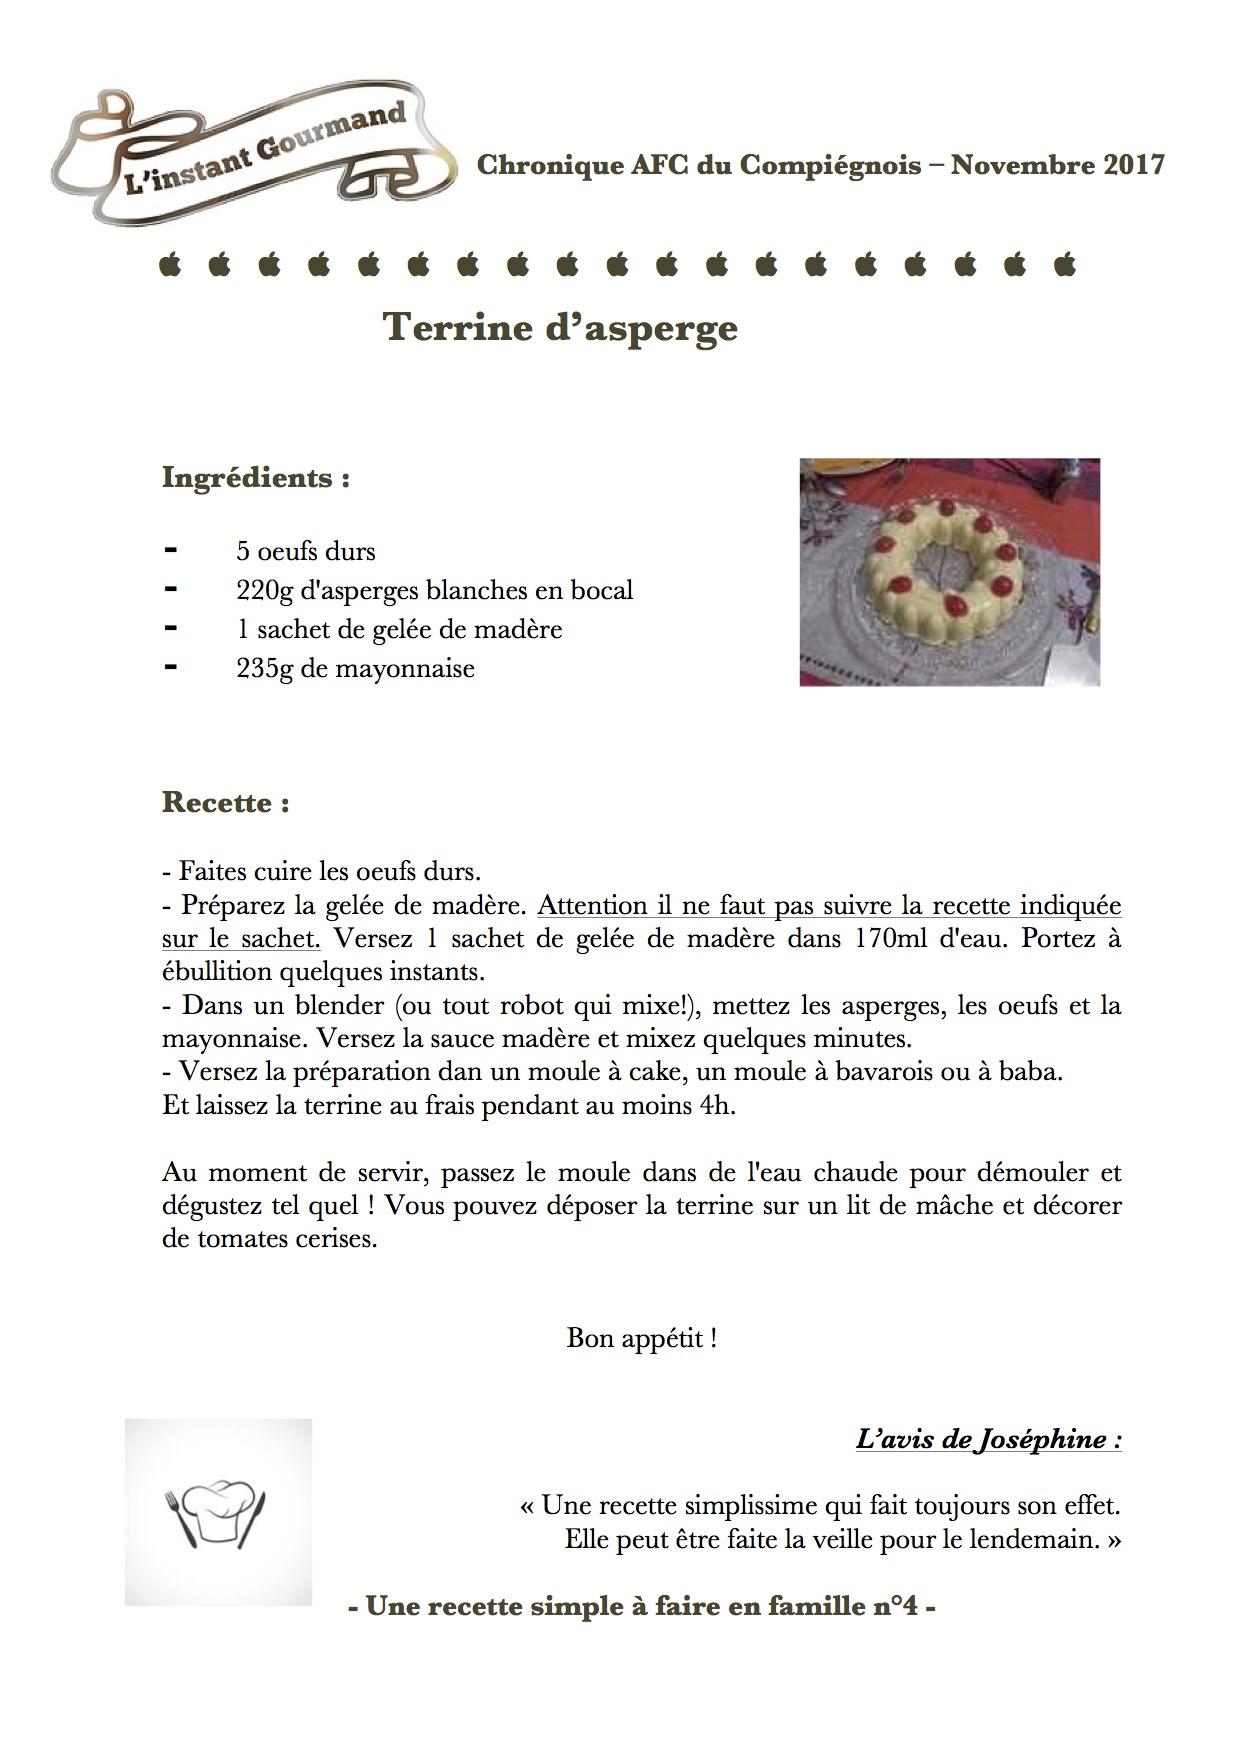 Chronique L'instant gourmand 4 Novembre 2017